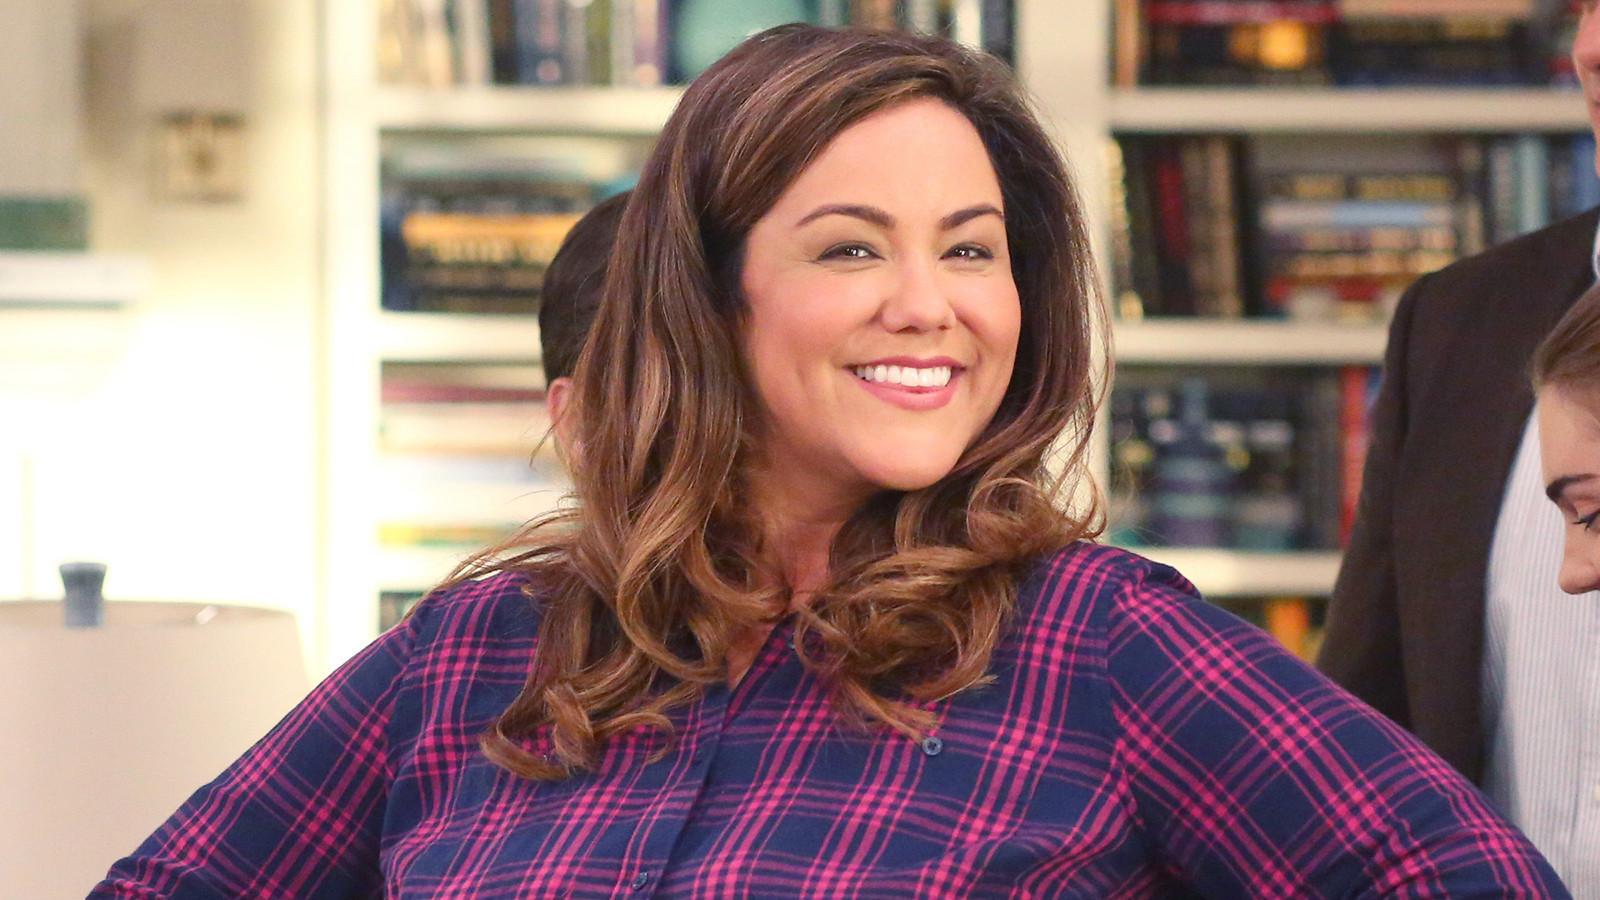 Wednesdays TV highlights American Housewife on ABC LA